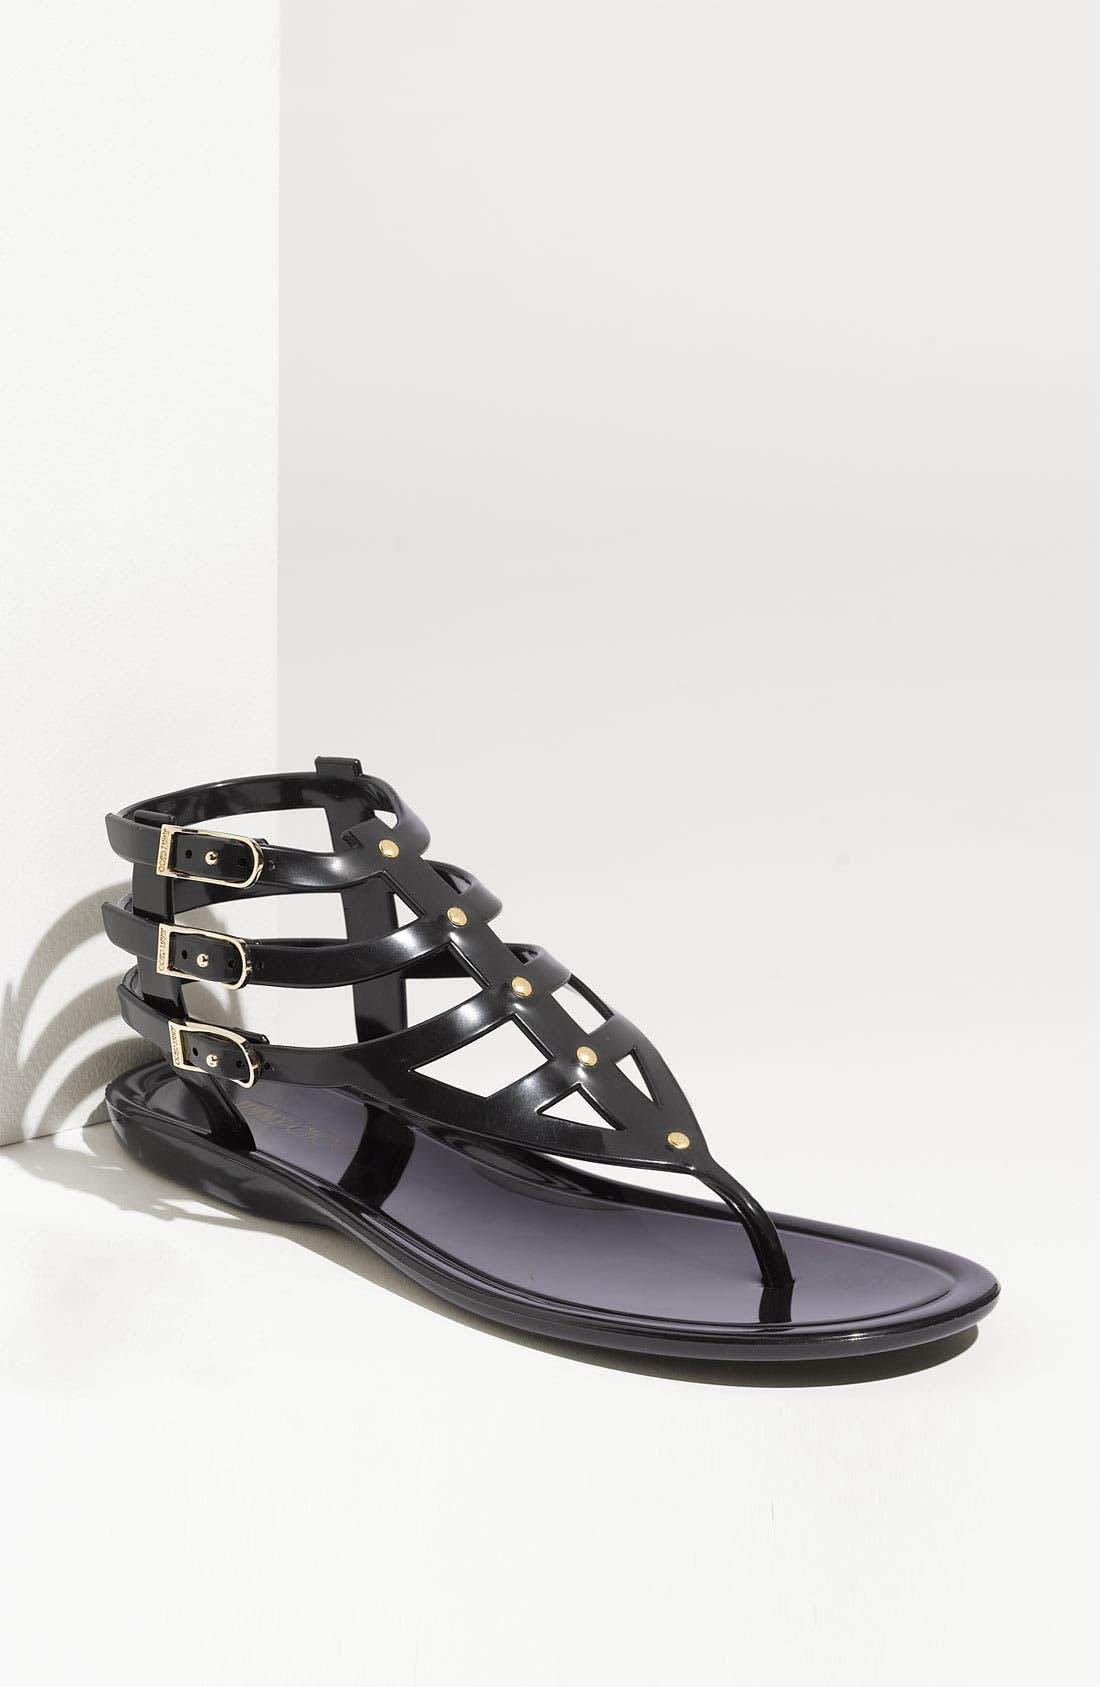 JIMMY CHOO 'Margot' Jelly Flat Sandal, Main, color, 001